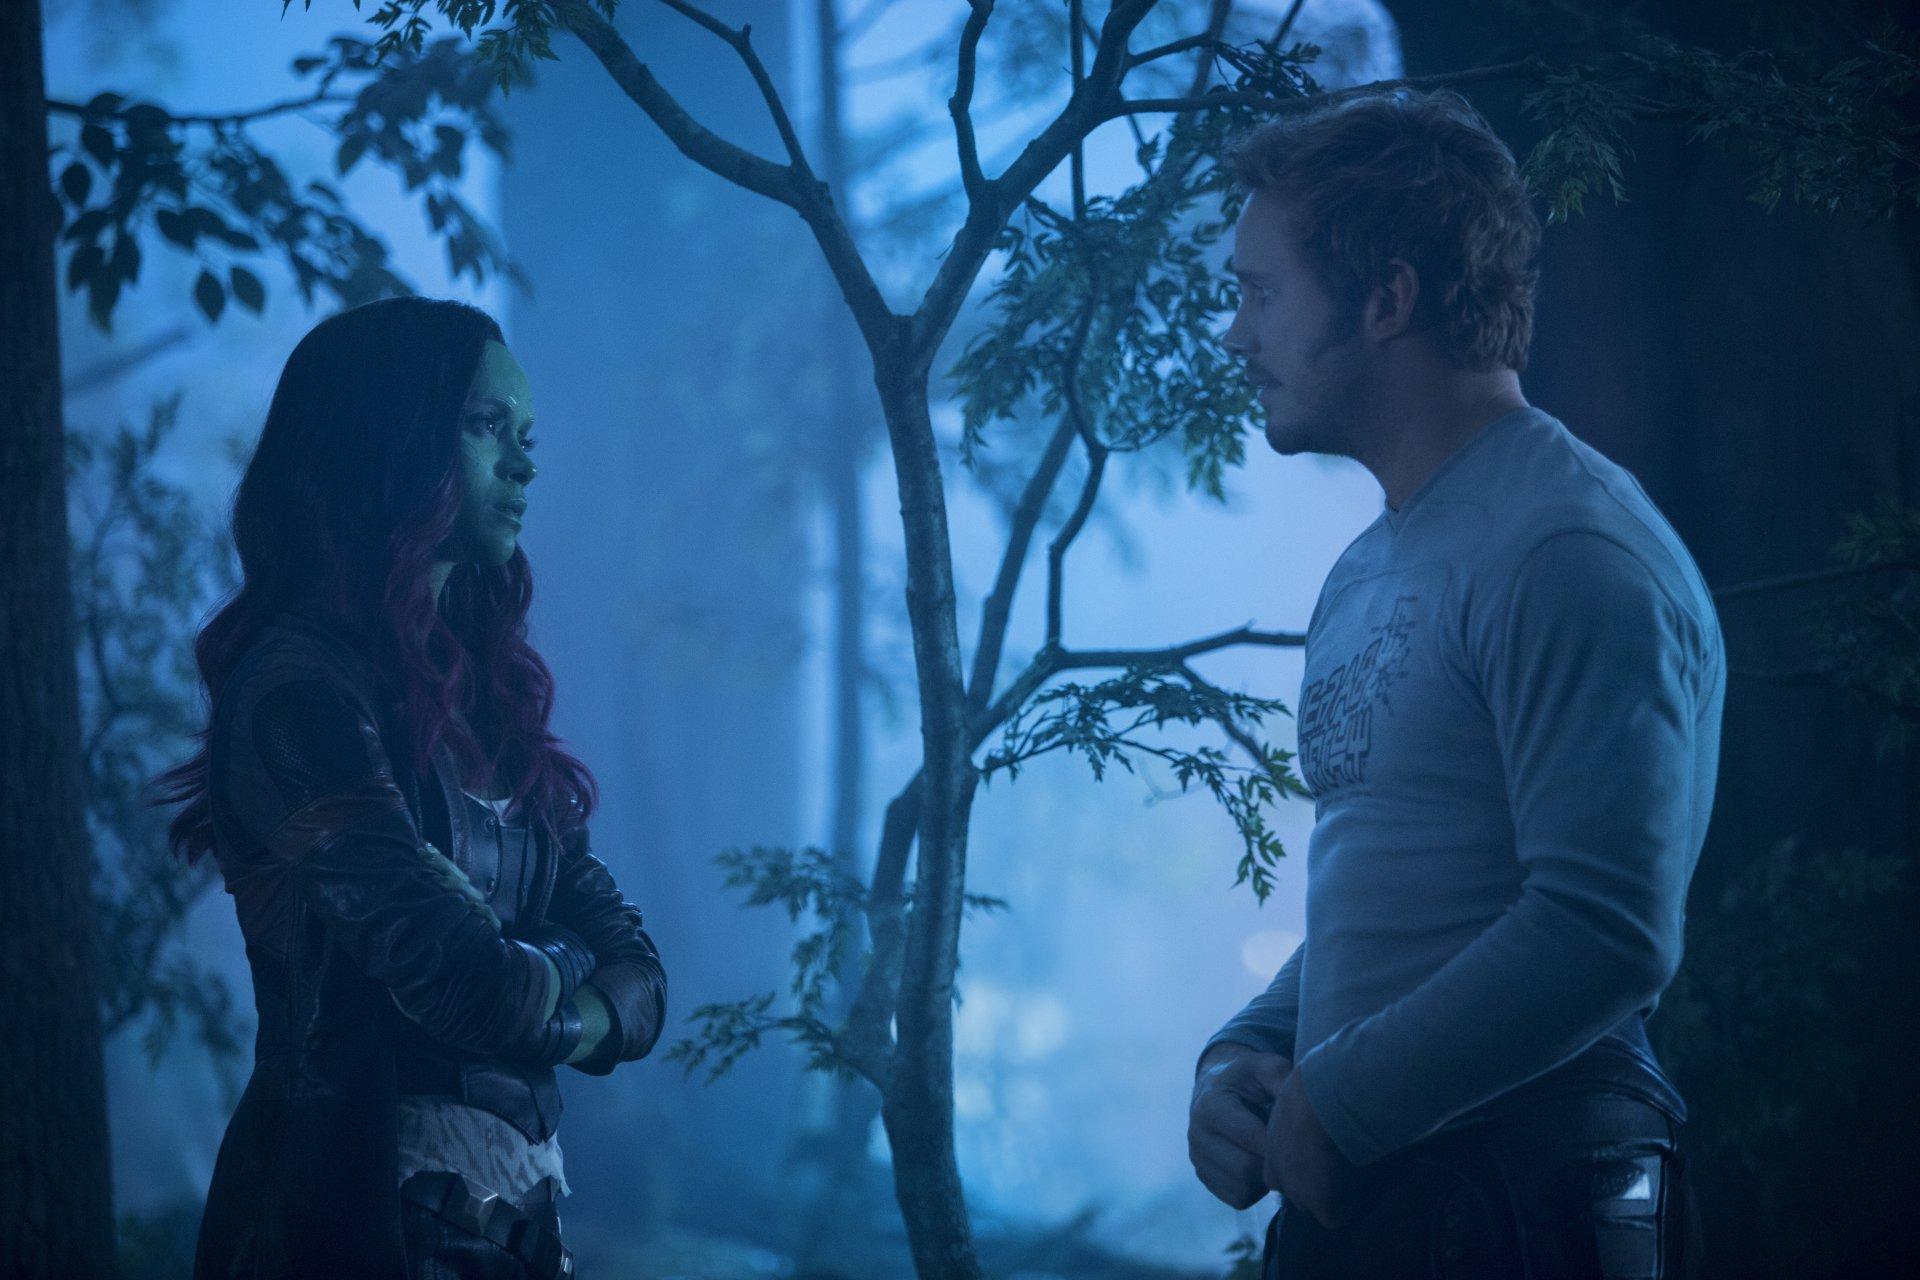 Movie - Guardians of the Galaxy Vol. 2  Zoe Saldana Gamora Star Lord Chris Pratt Wallpaper